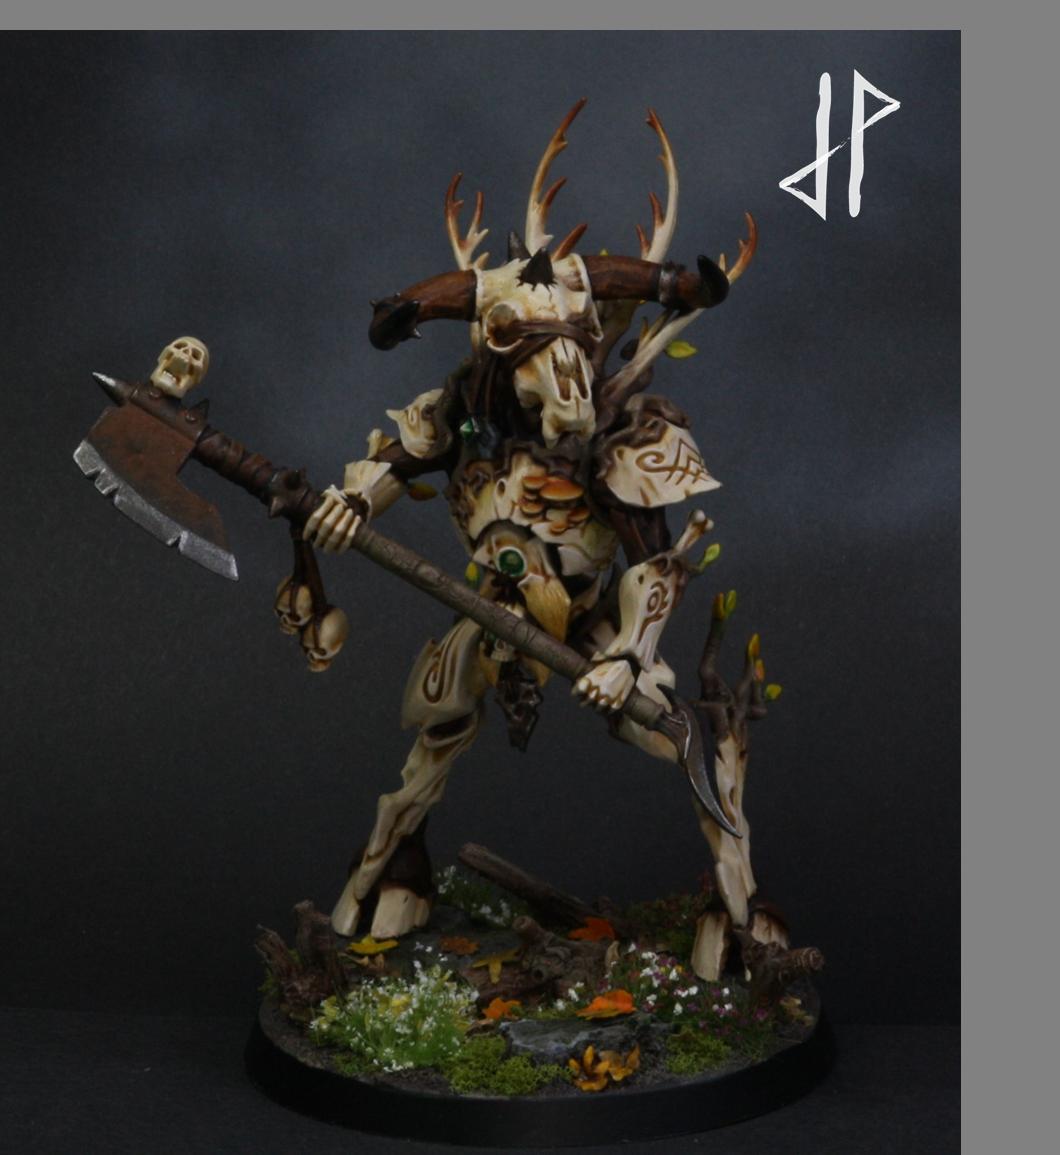 Age Of Sigmar, Beastmen, Construct, Minotaur, Warhammer Fantasy